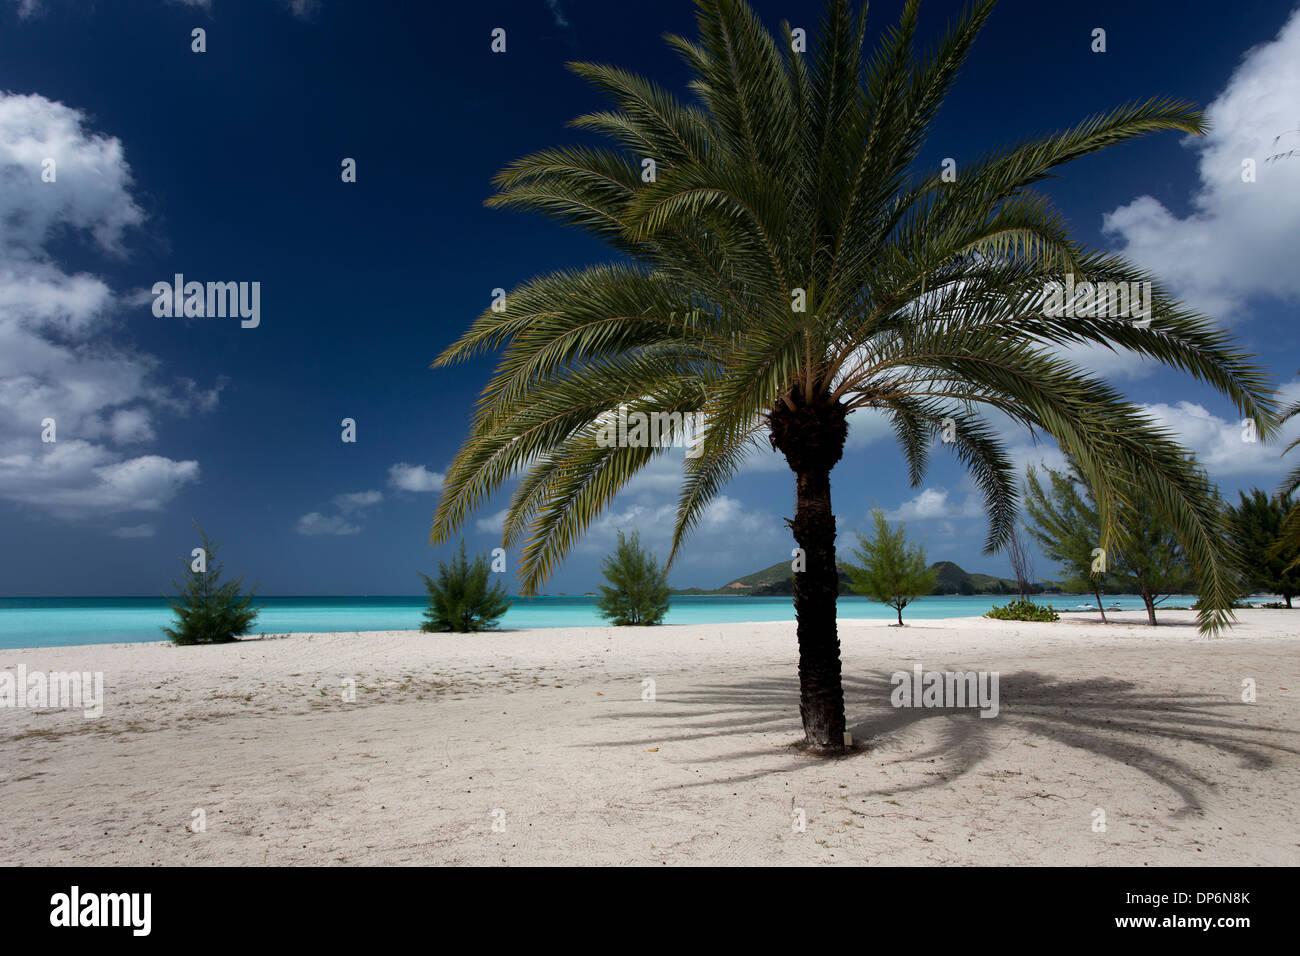 Jolly Beach, Antigua, Leeward Islands, West Indies - Stock Image